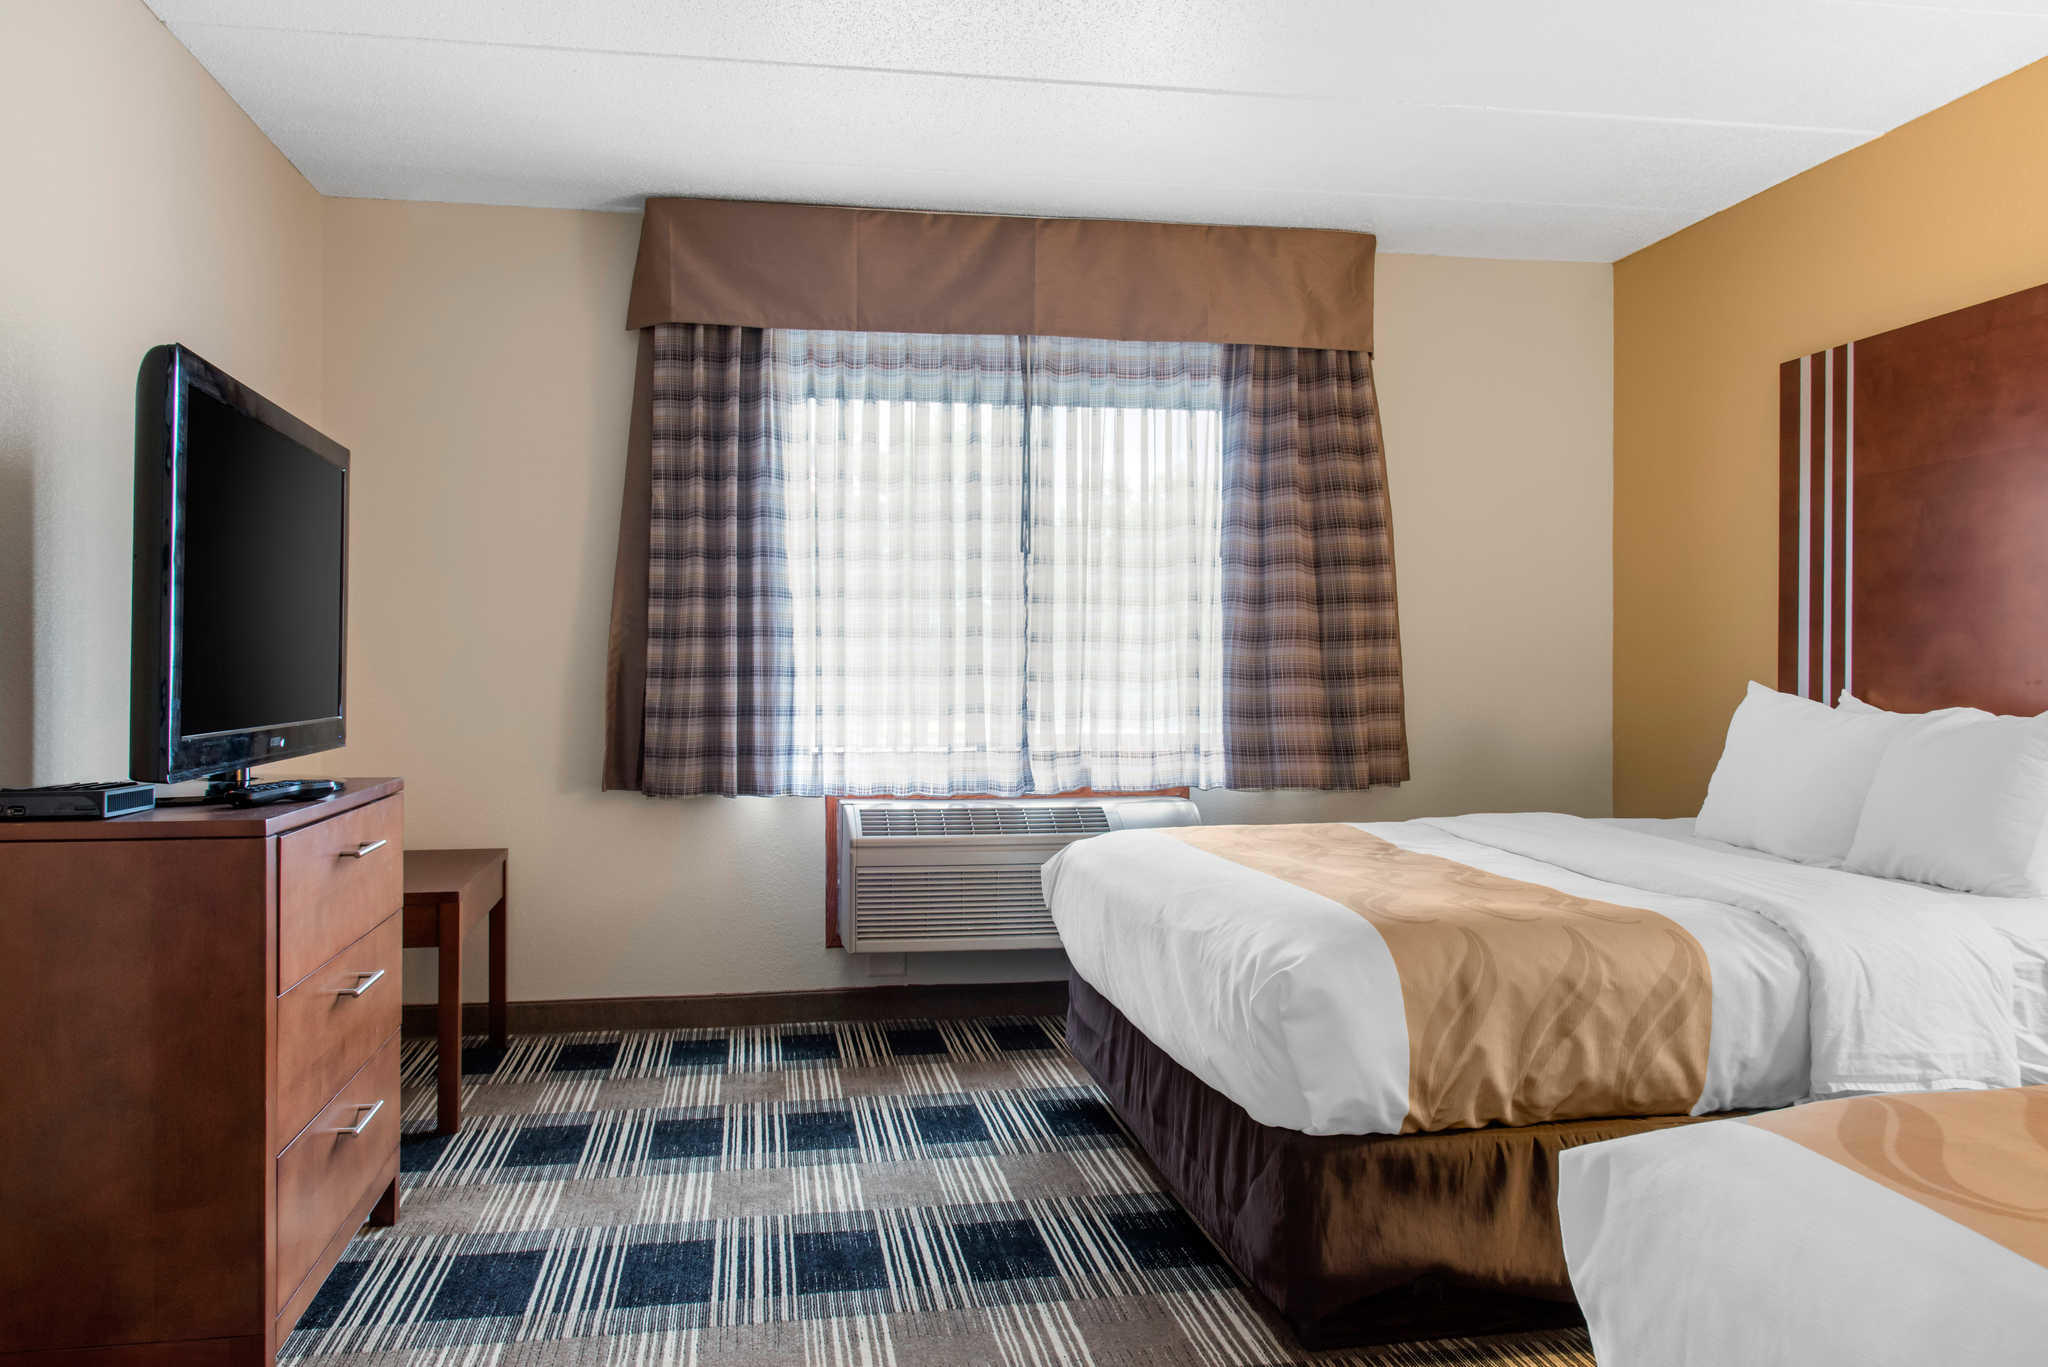 Quality Inn image 47